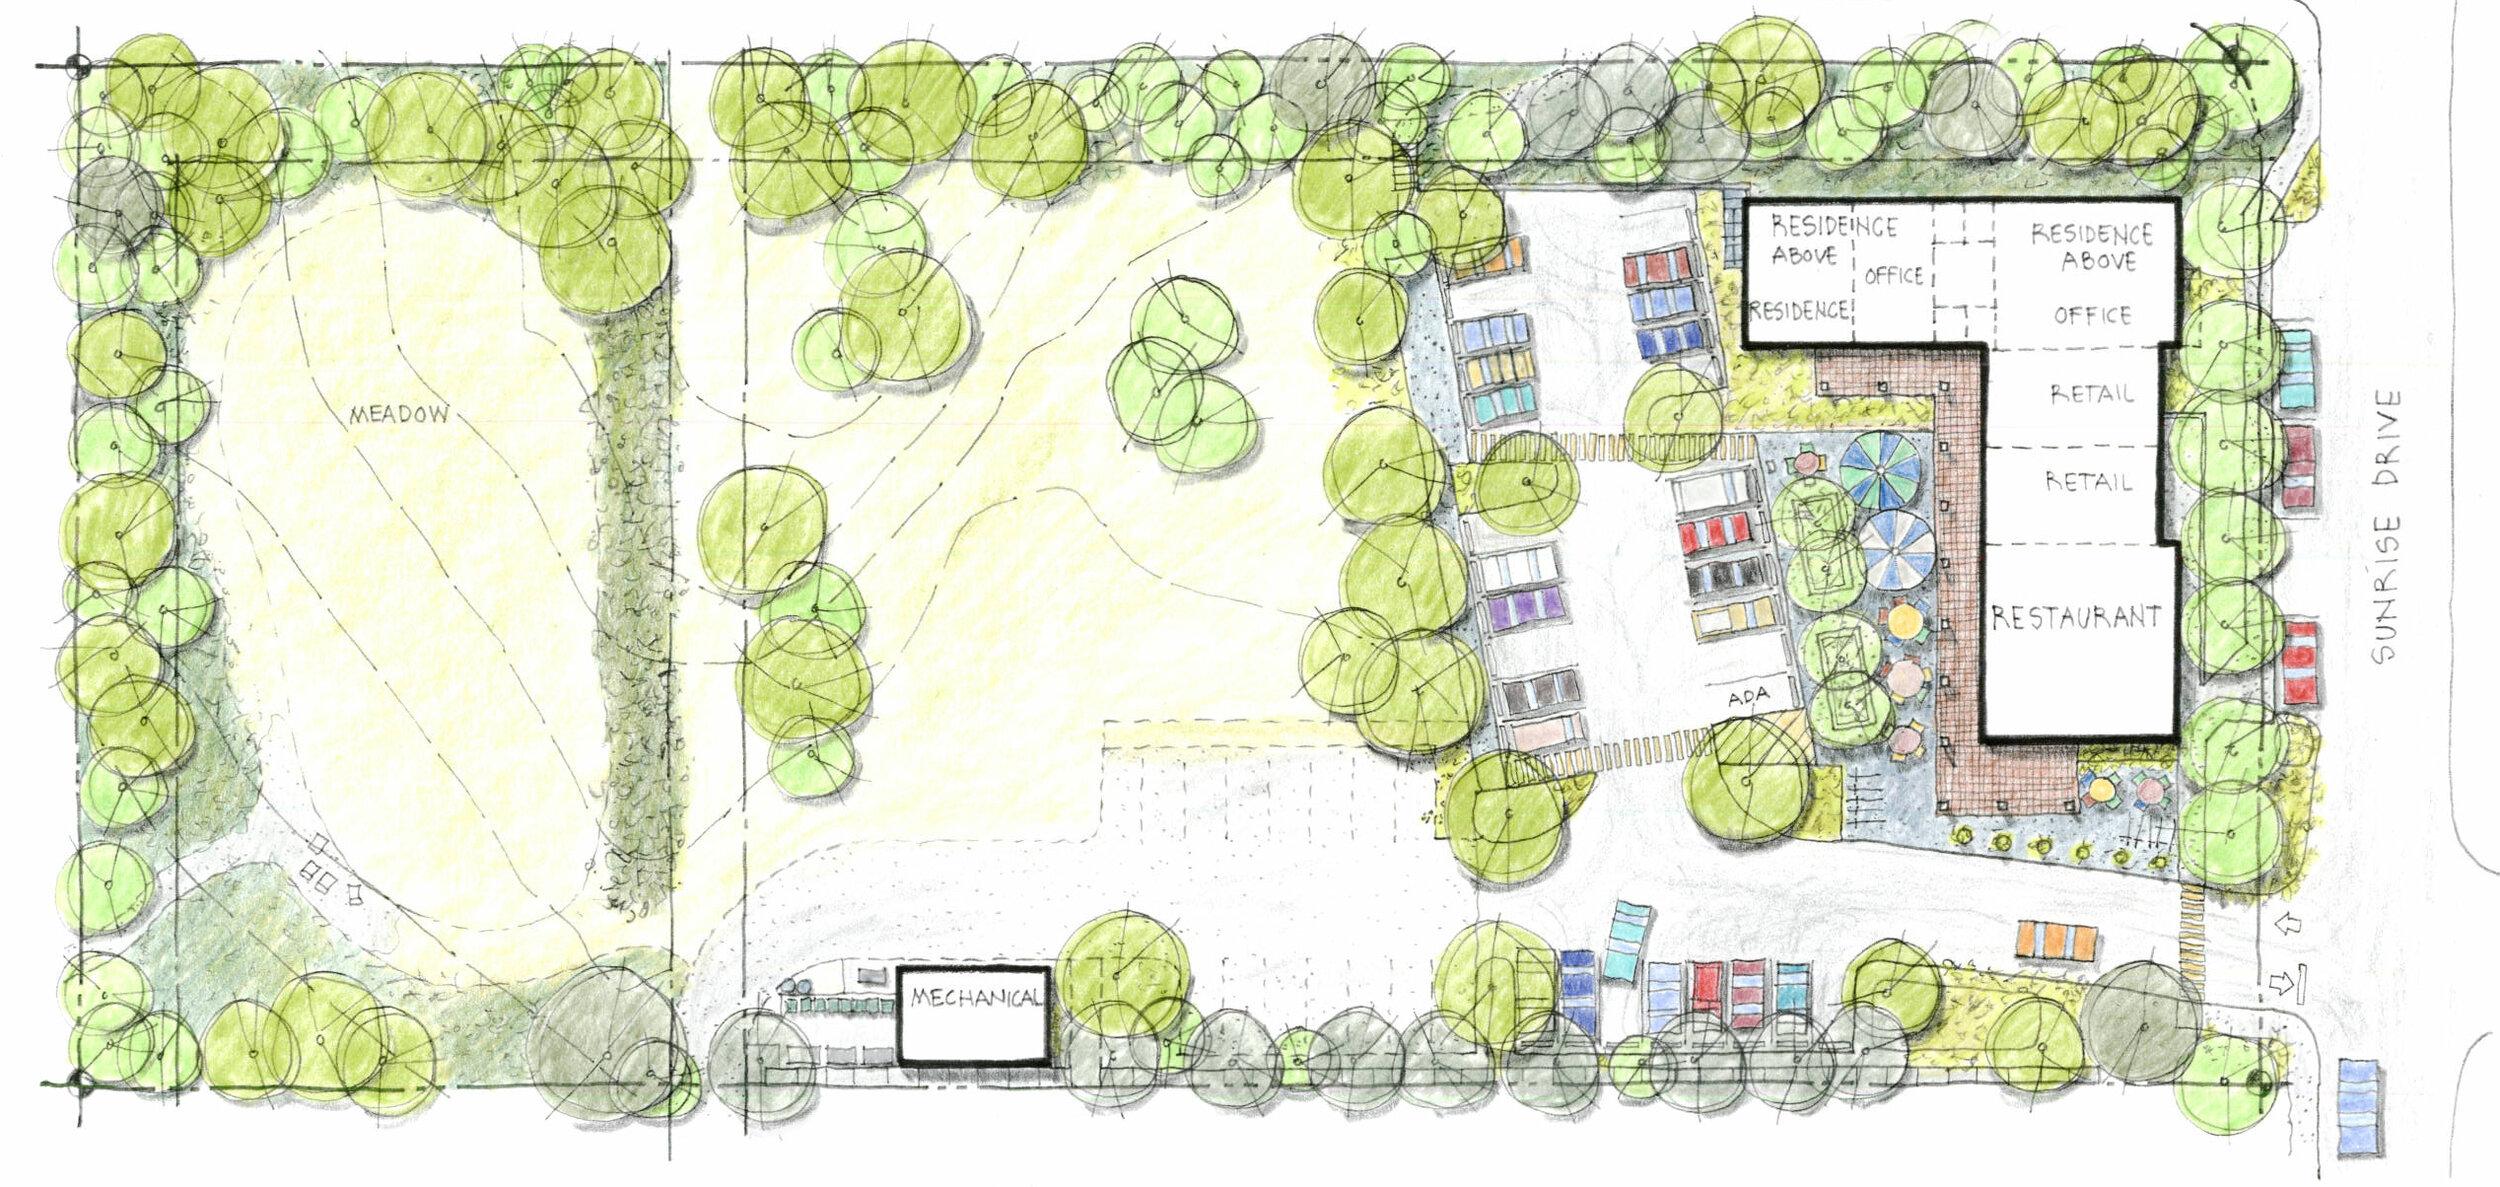 Site Plan_9-18-19 low res_REV_AT.jpg